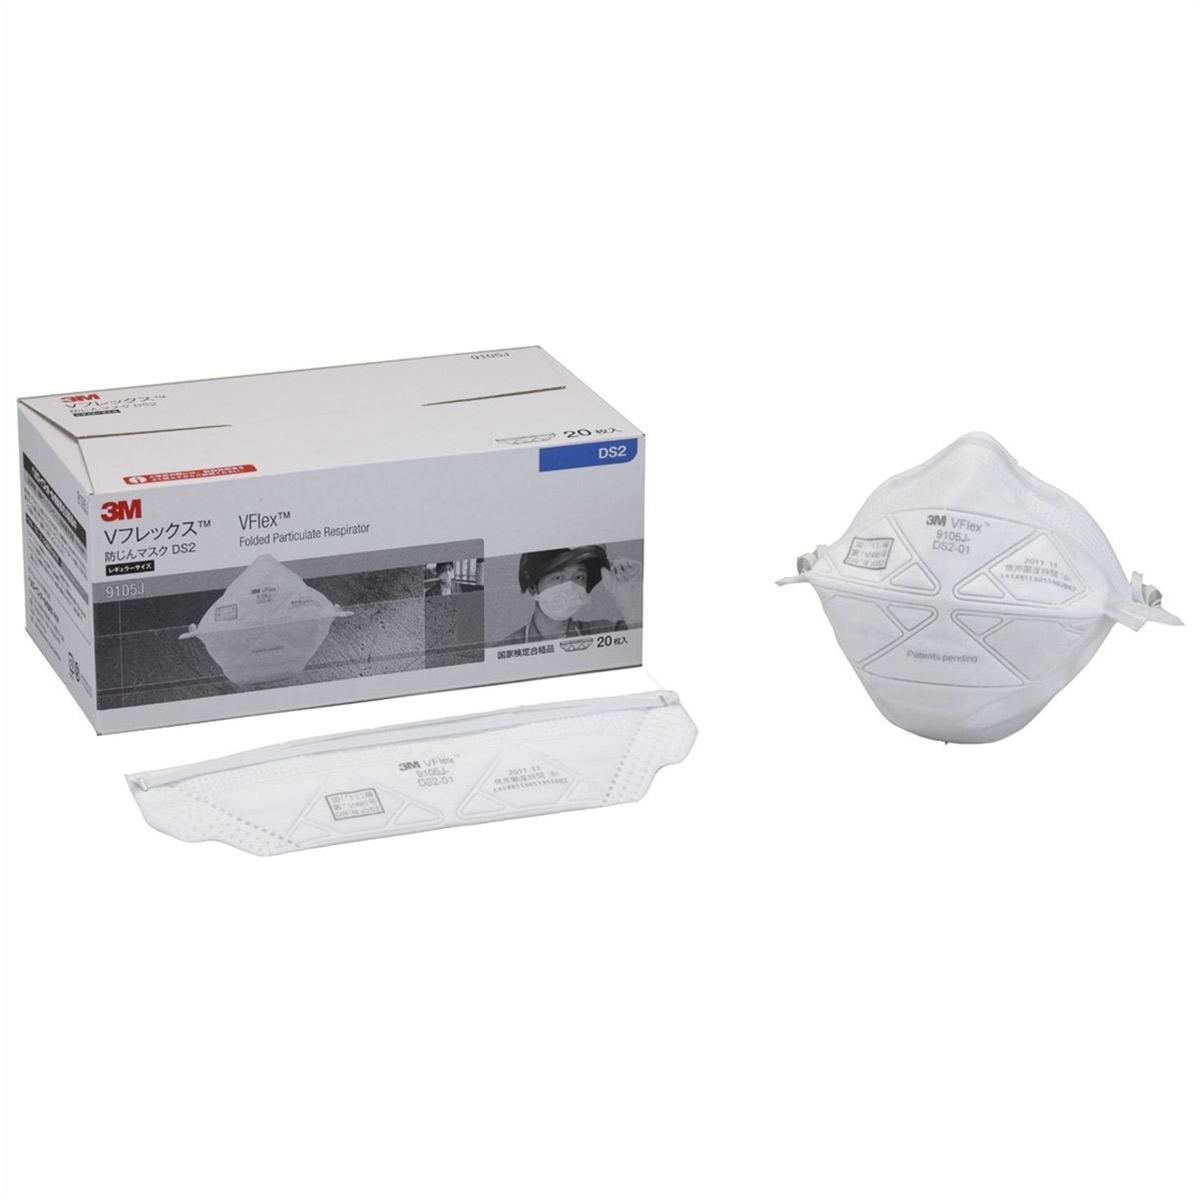 3M(スリーエム) Vフレックス 防じんマスク レギュラーサイズ 20枚入り 国家検定合格品 9105J-DS2